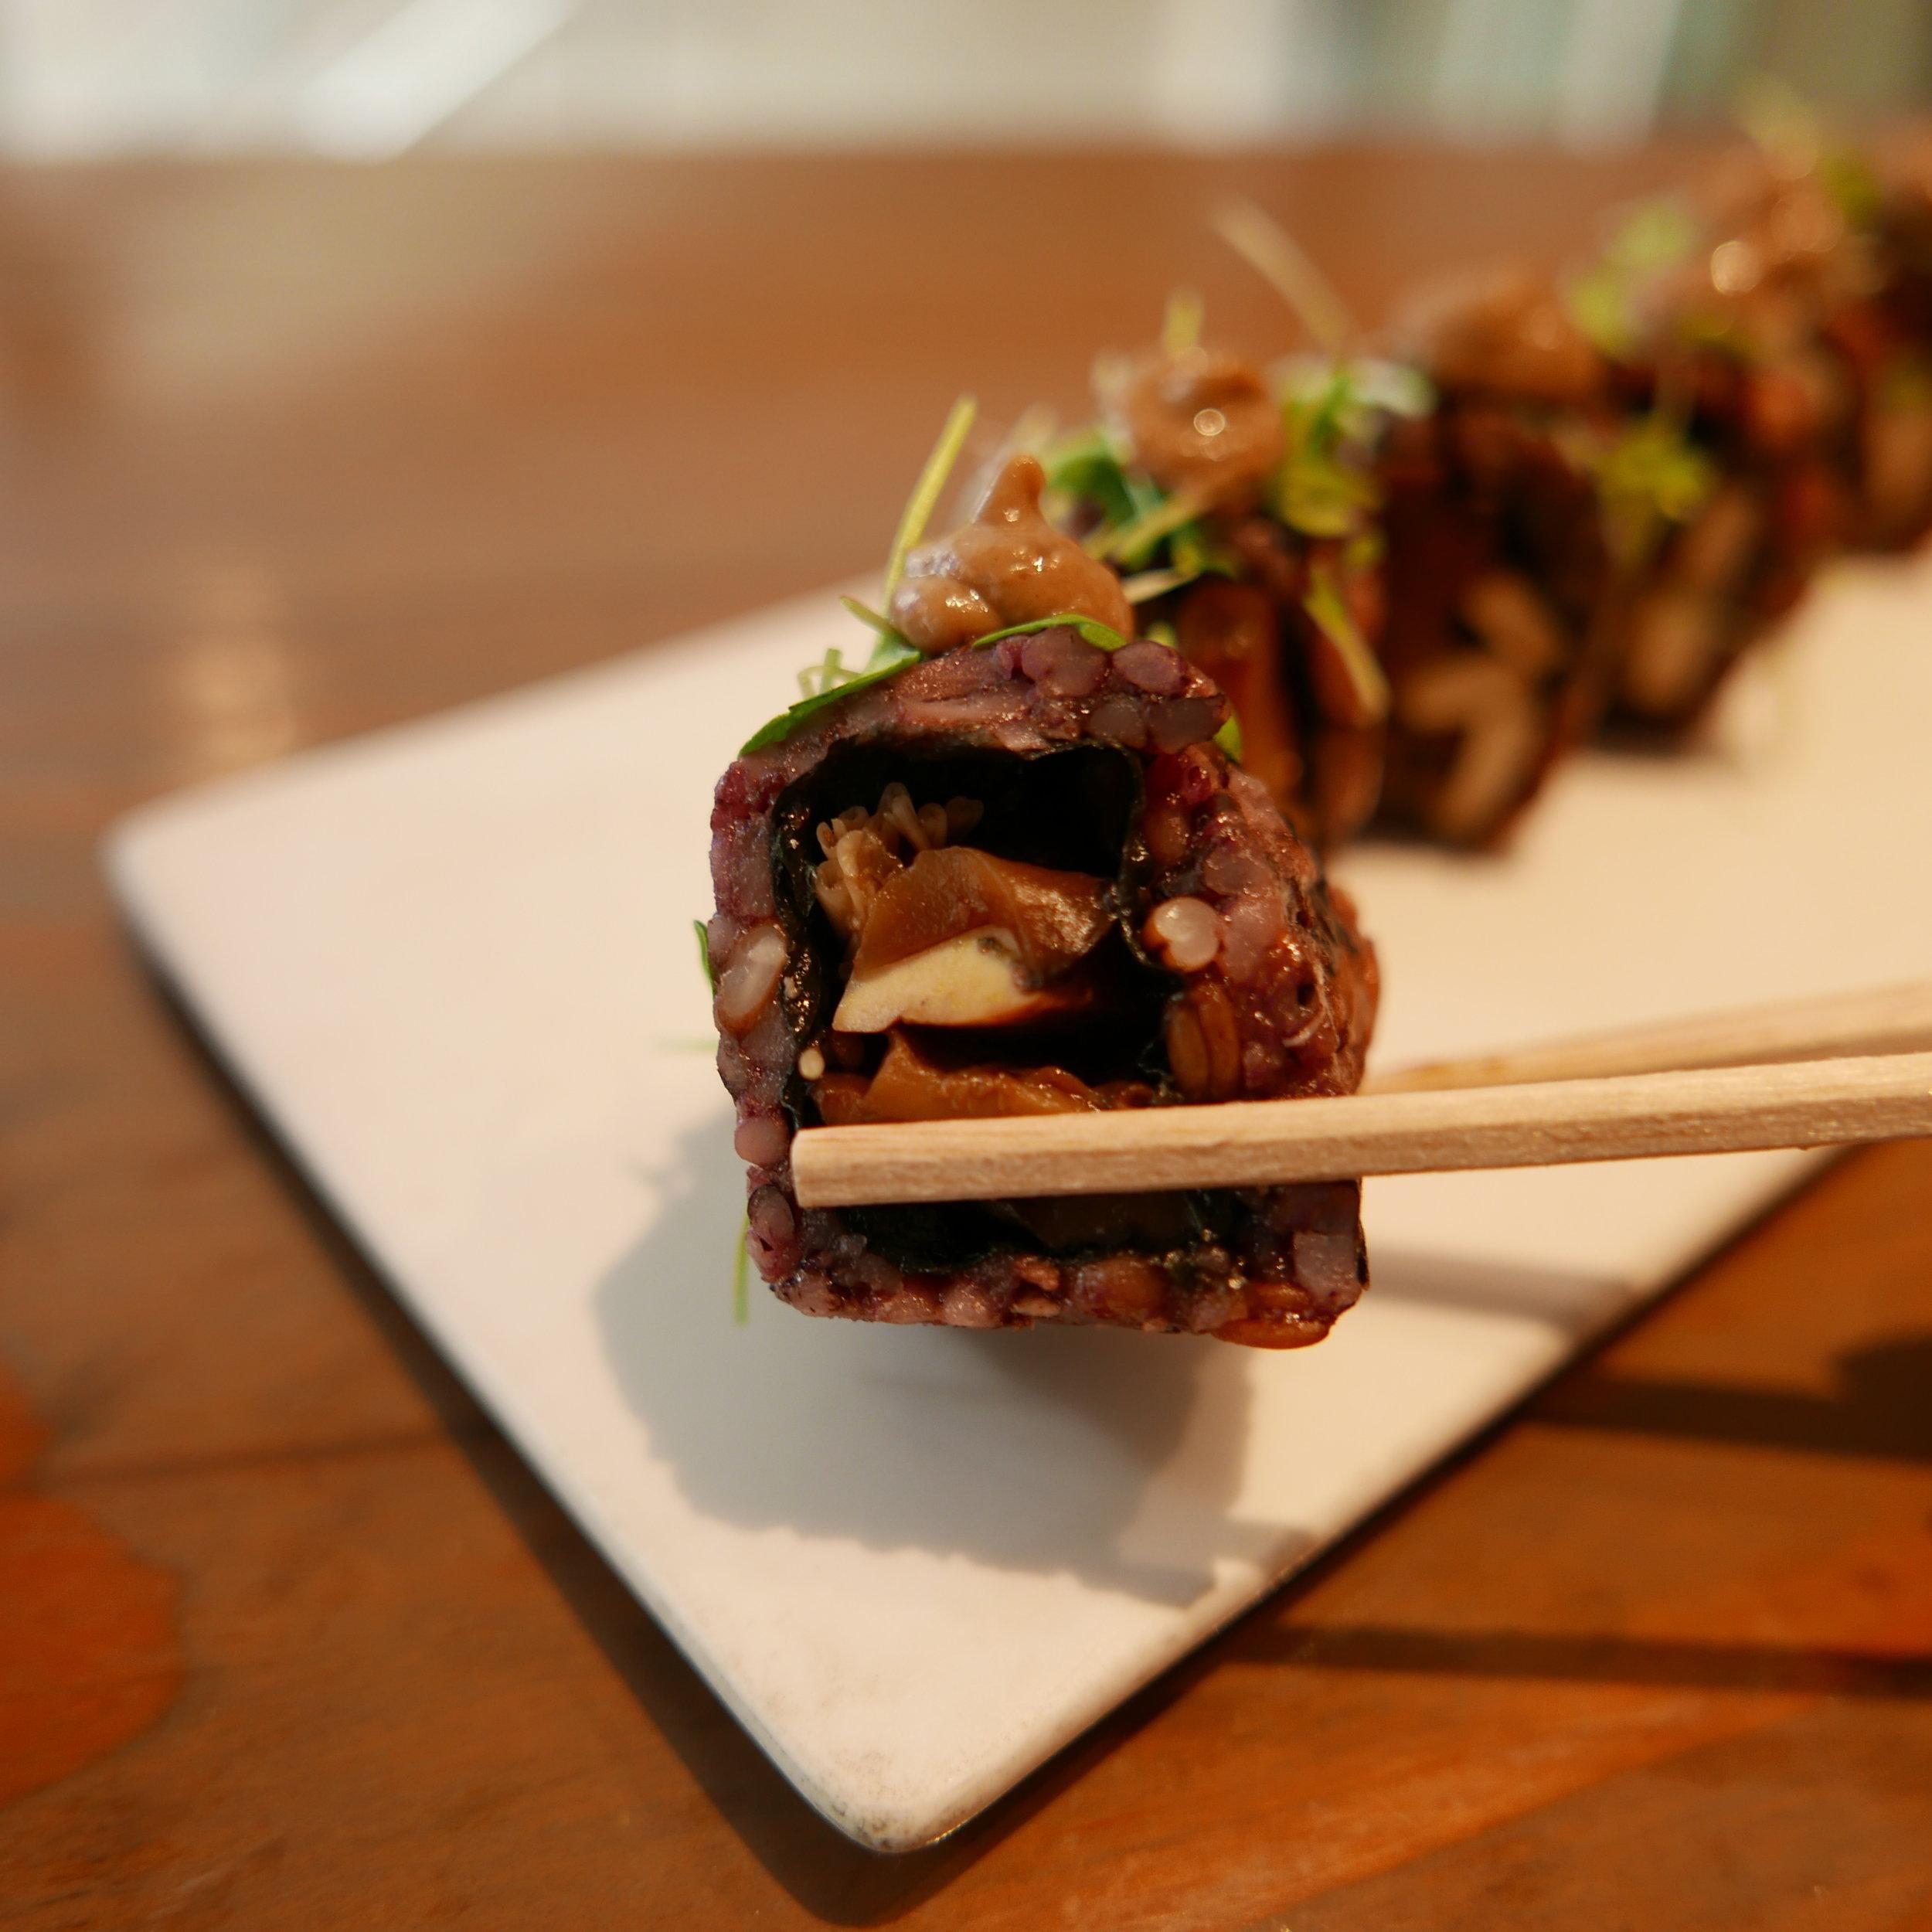 Mighty Mushroom - Six-grain rice, enoki mushrooms, baked tofu, braised shiitake, and micro arugula